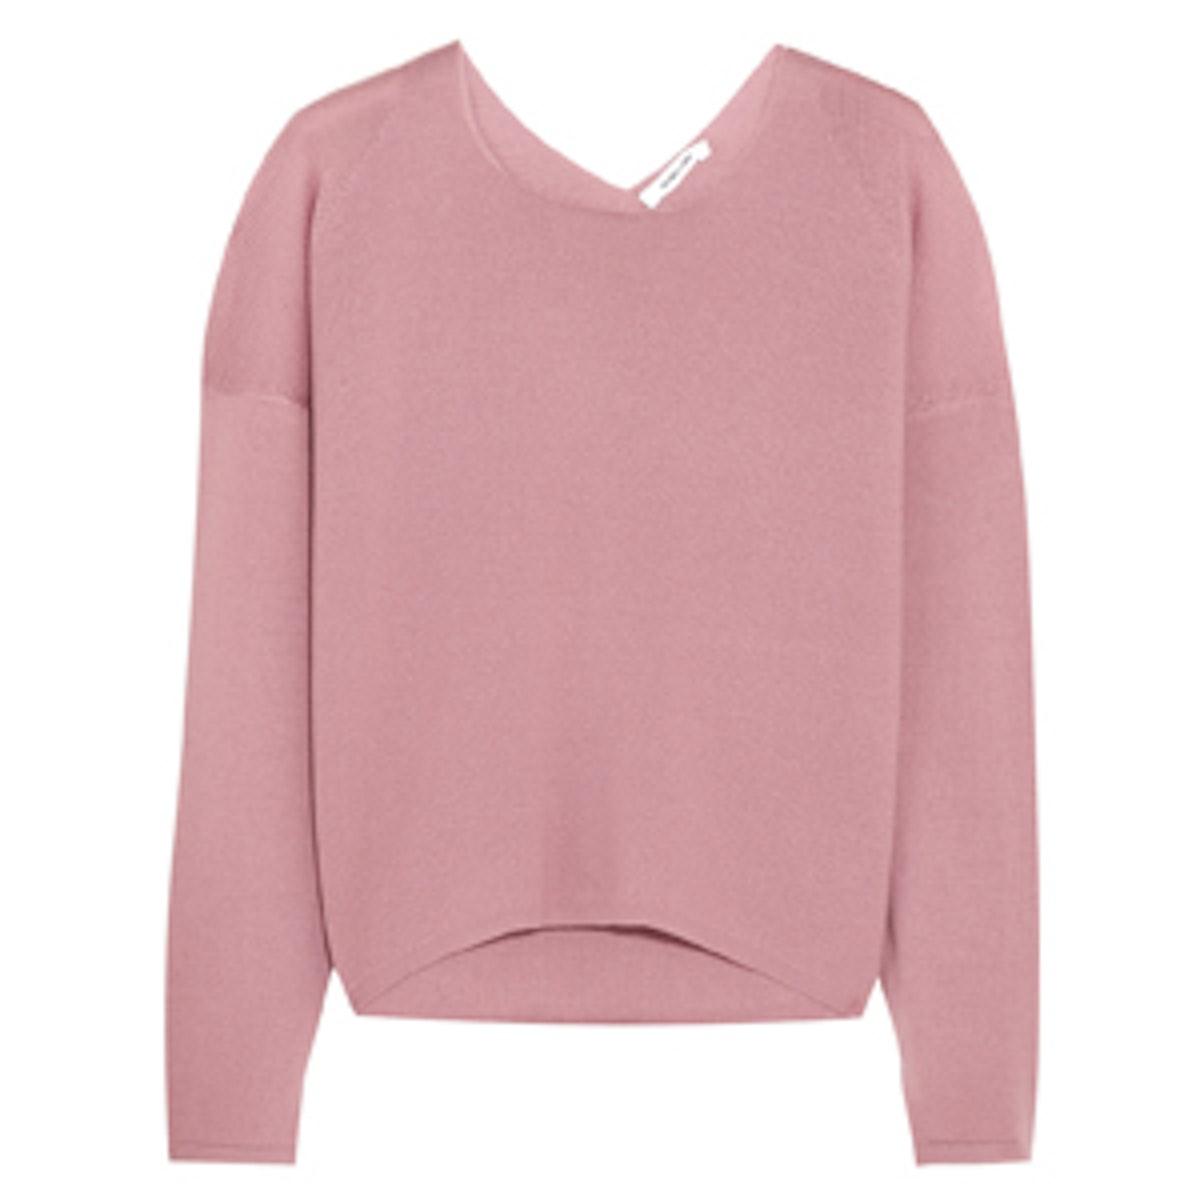 Pink Wool Sweater